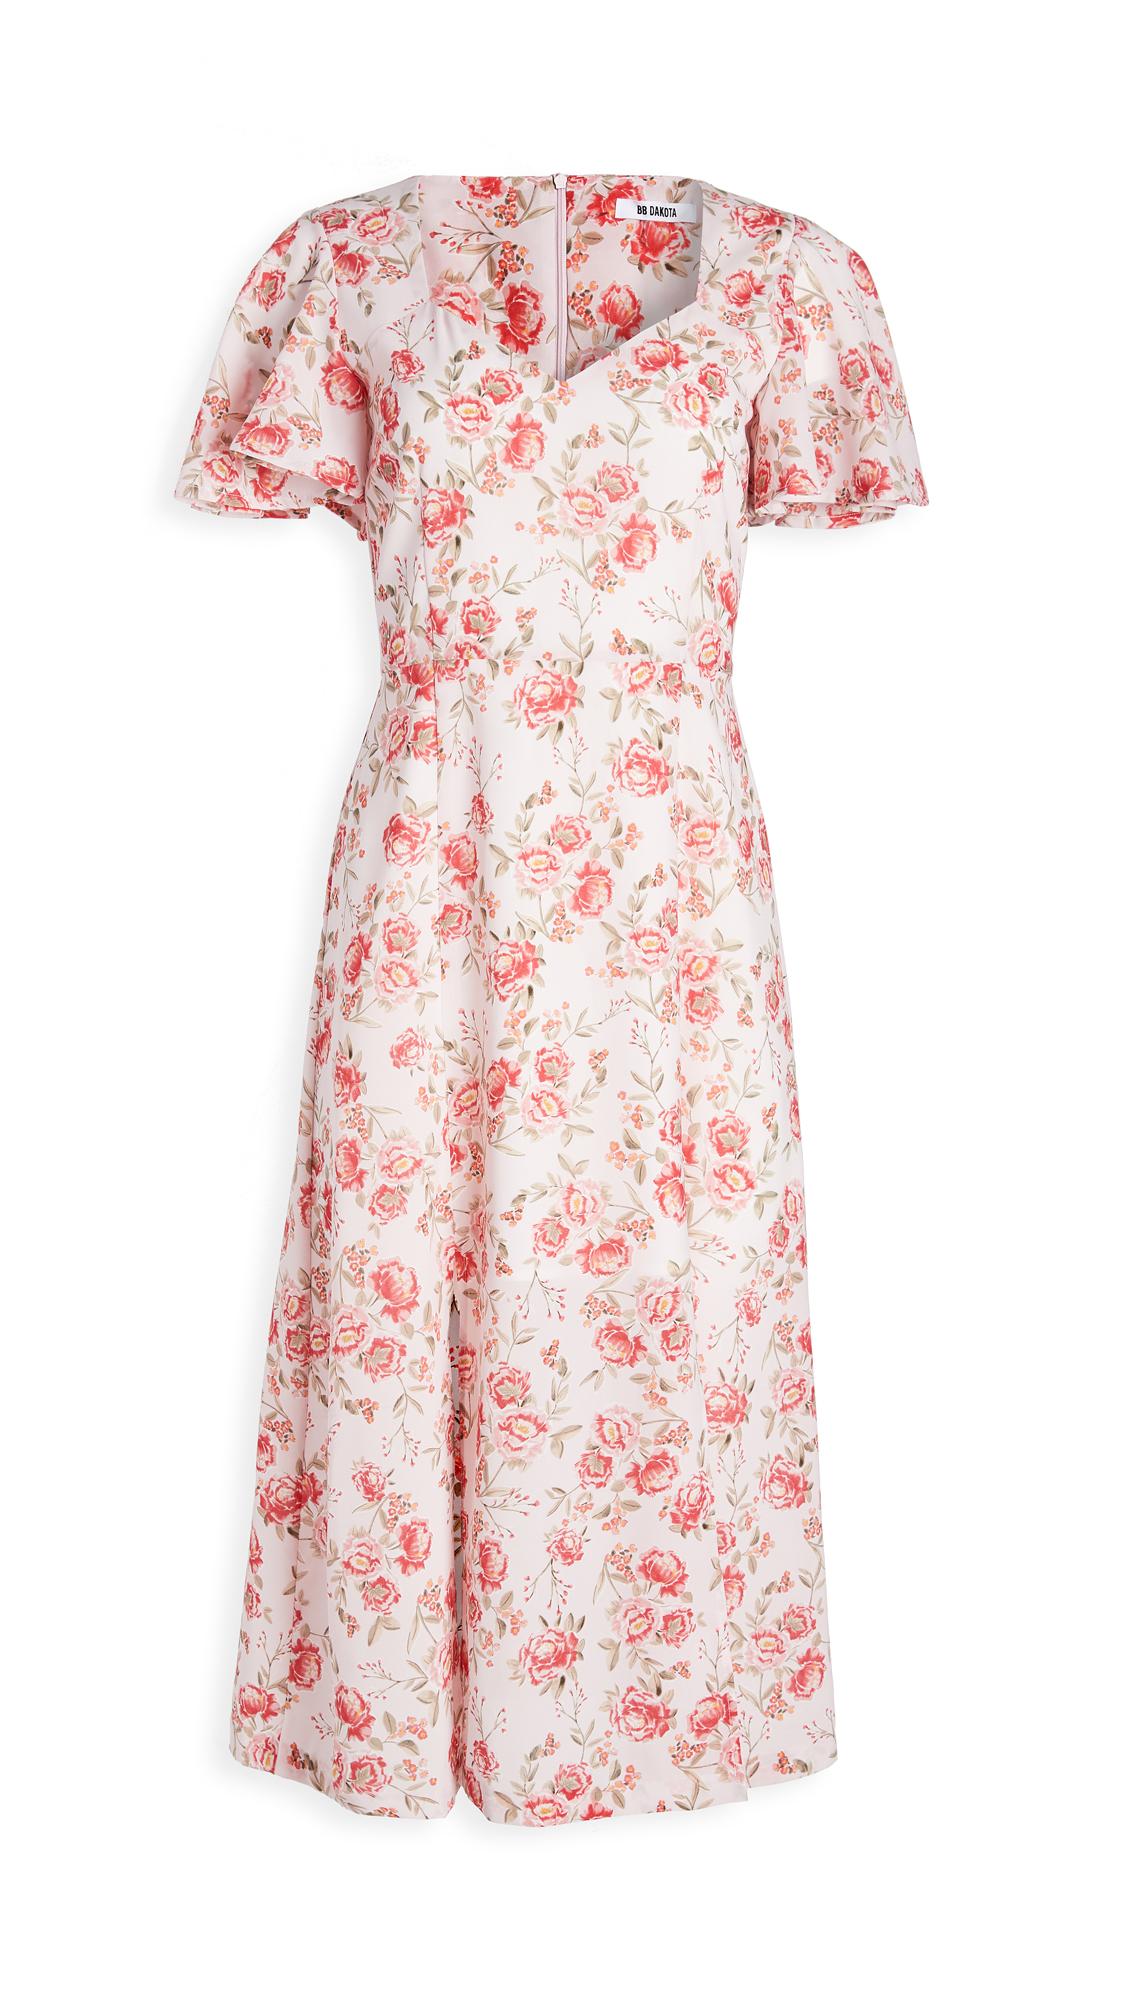 BB Dakota Endless Love Dress